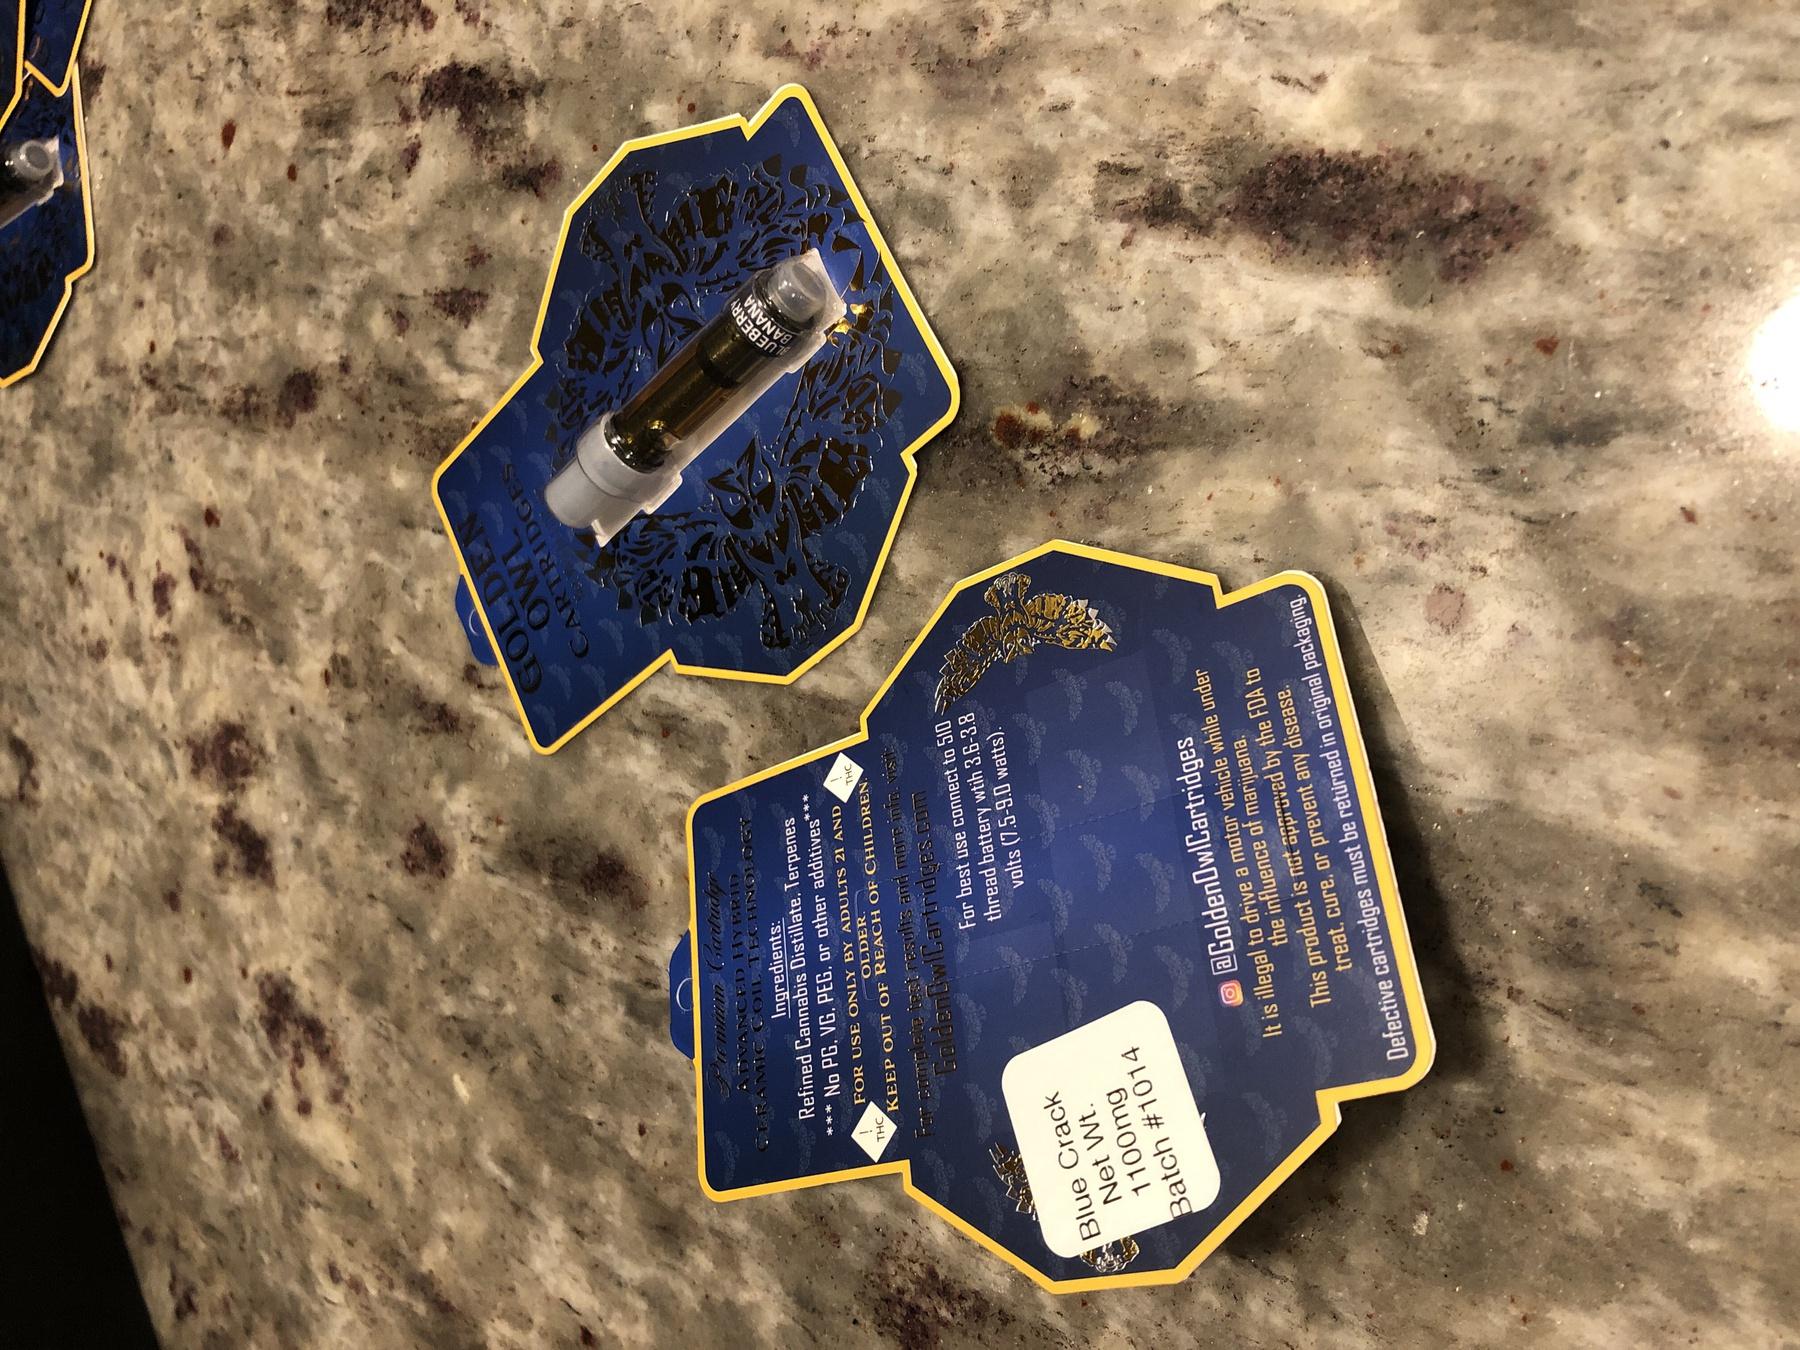 Blue Crack 1.0 Cartridge (Golden Owl Brand) Product image